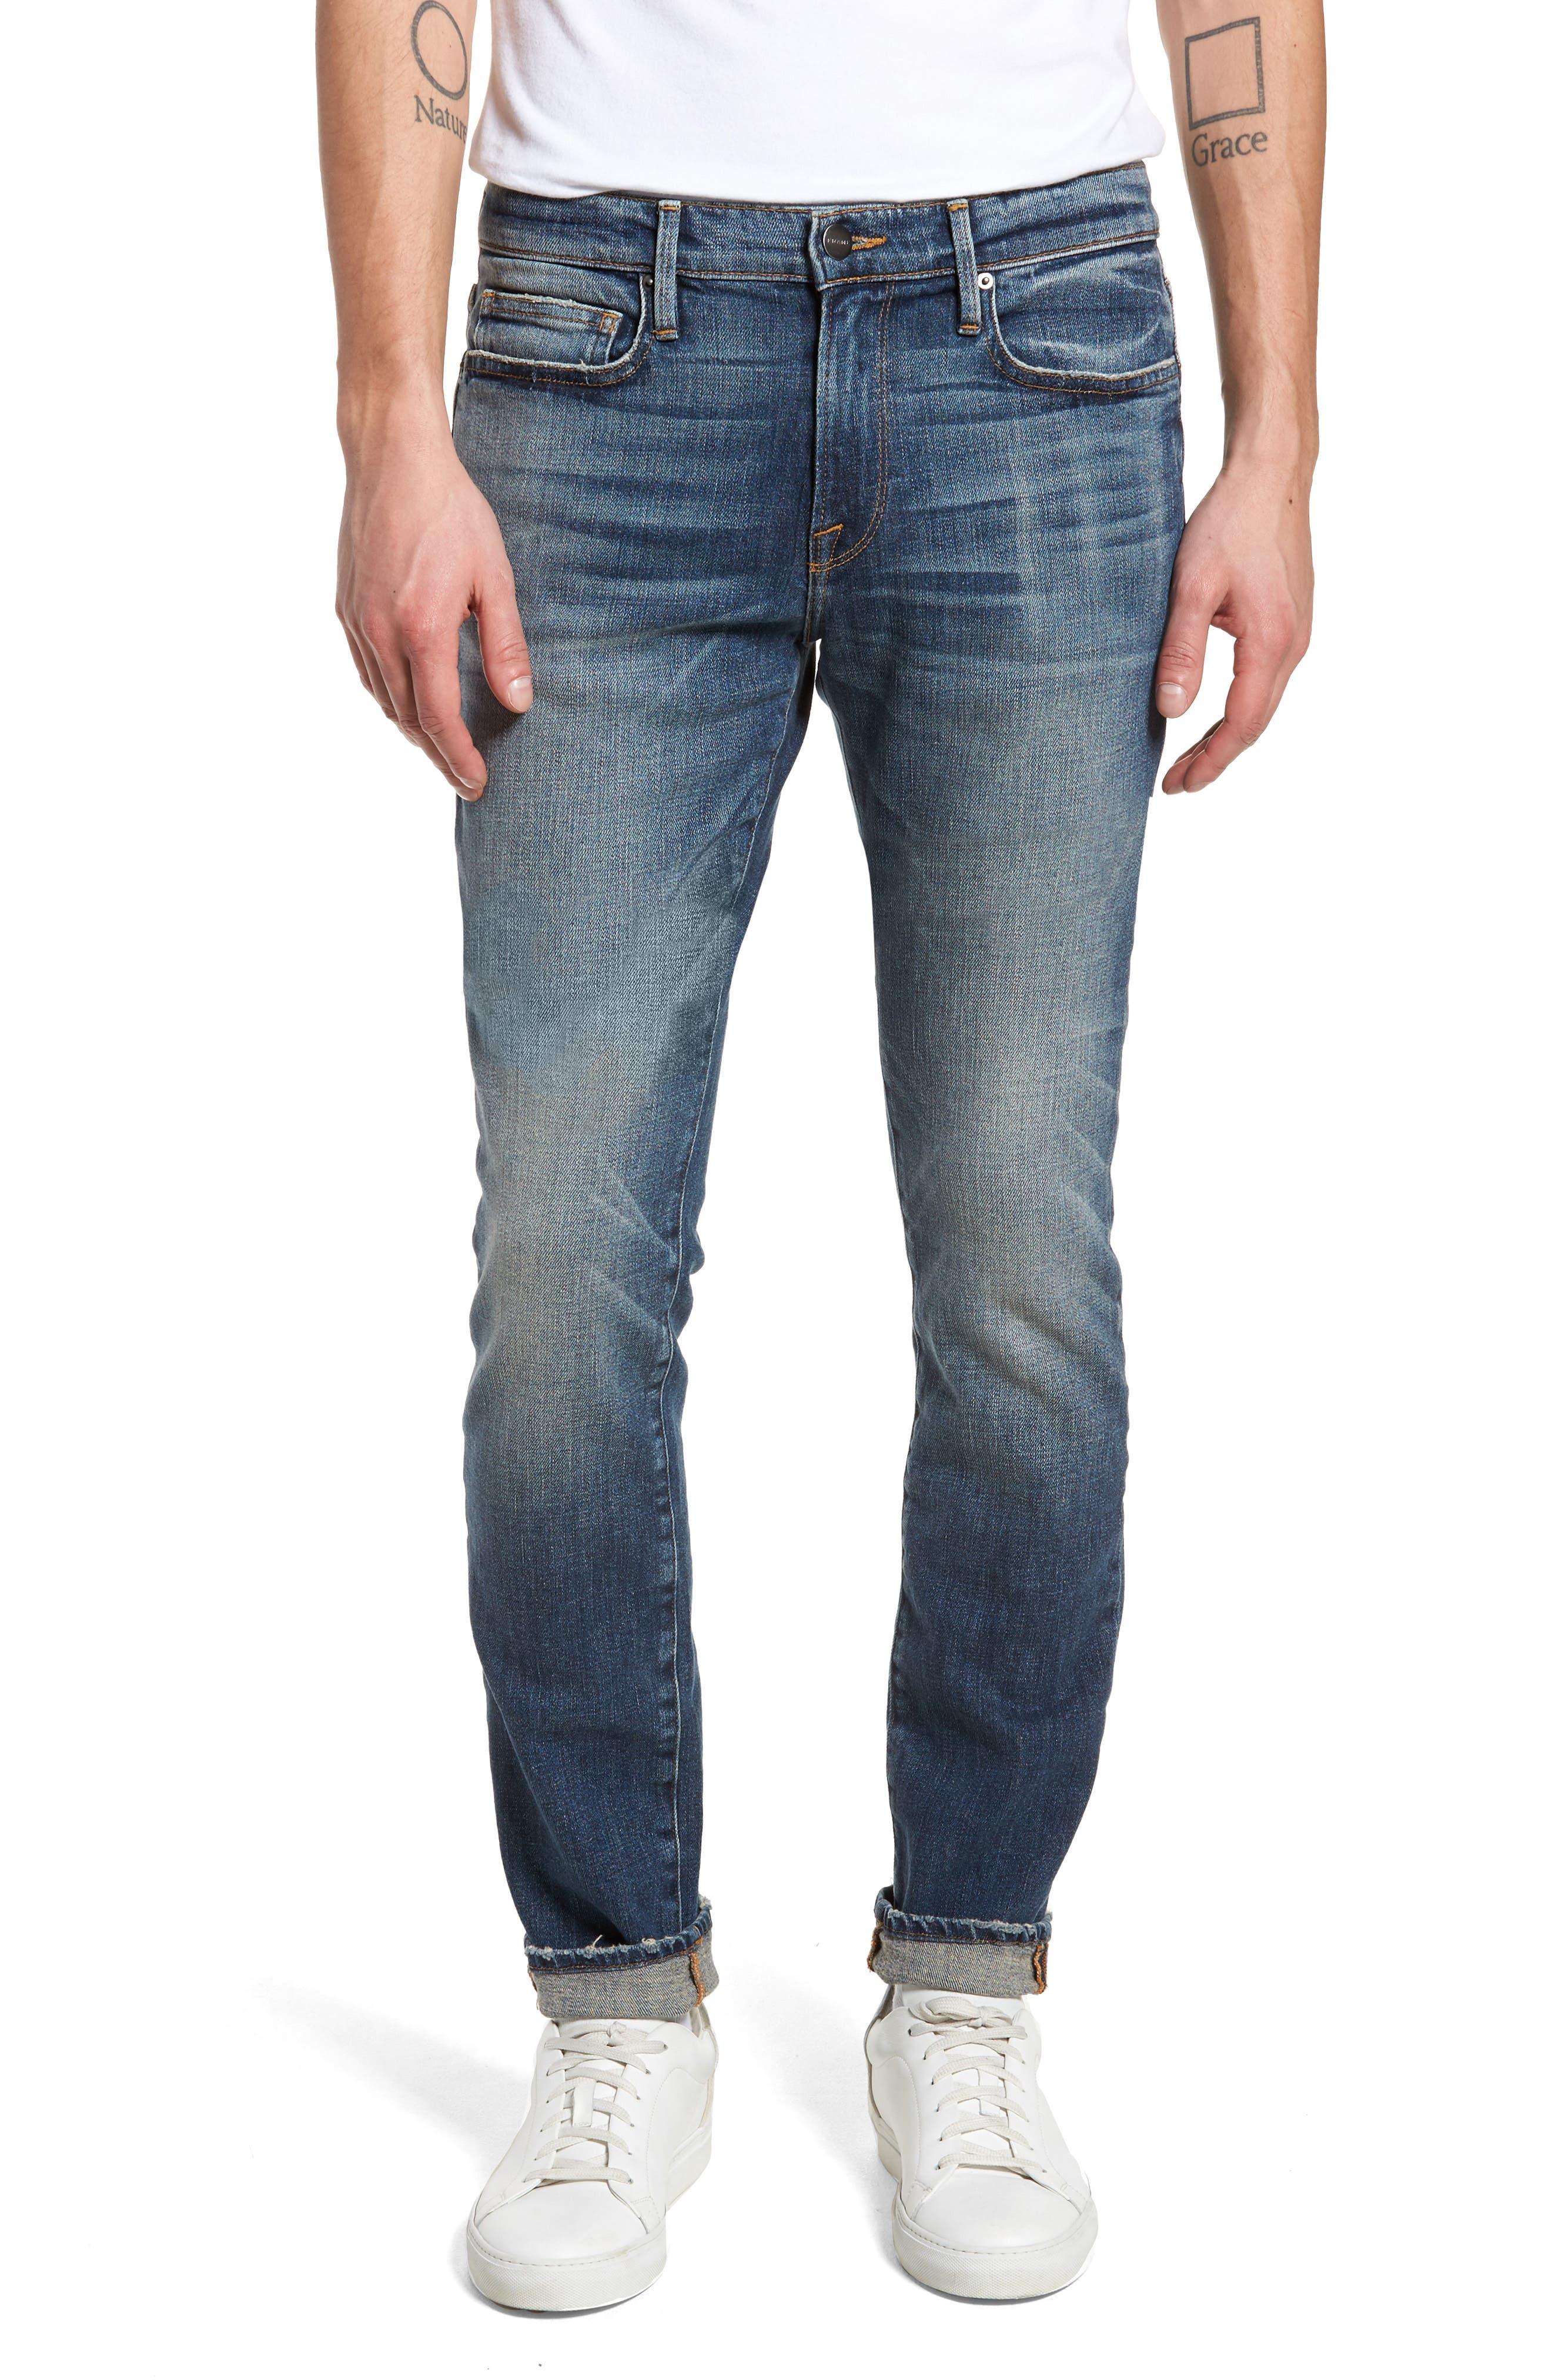 L'Homme Skinny Fit Jeans,                         Main,                         color, 405